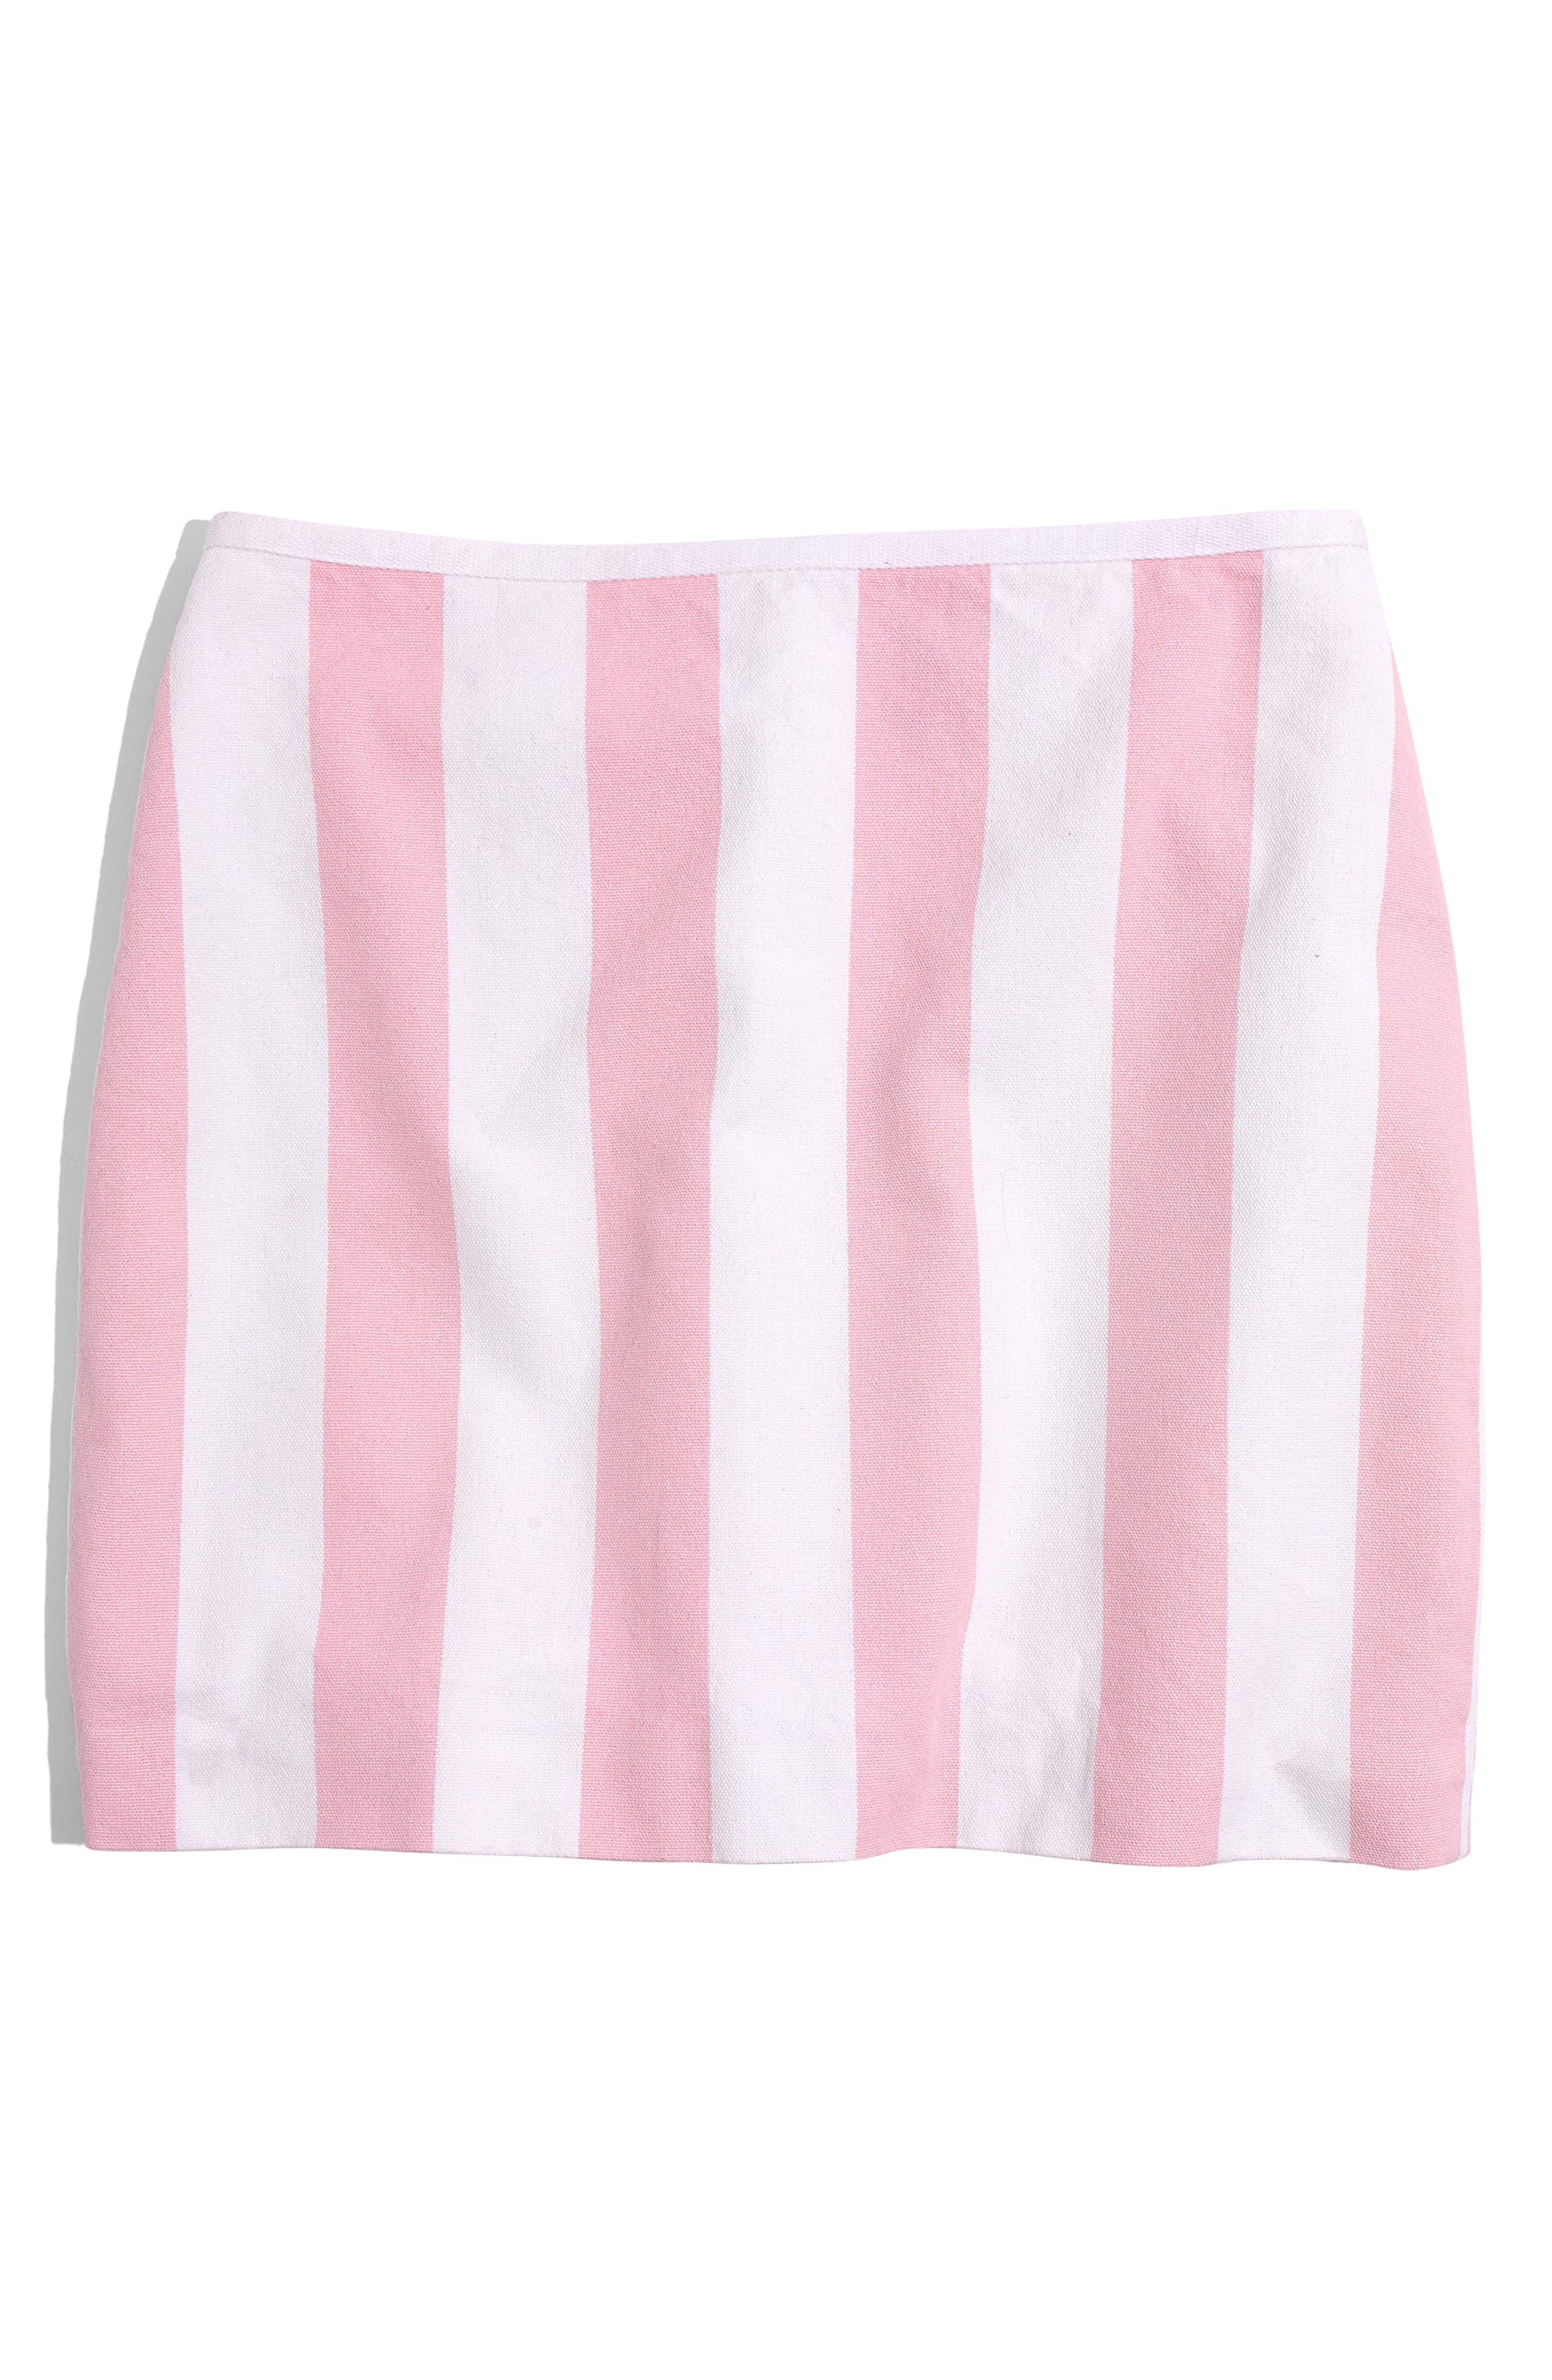 Gamine Stripe Miniskirt,                             Alternate thumbnail 2, color,                             Petal Pink